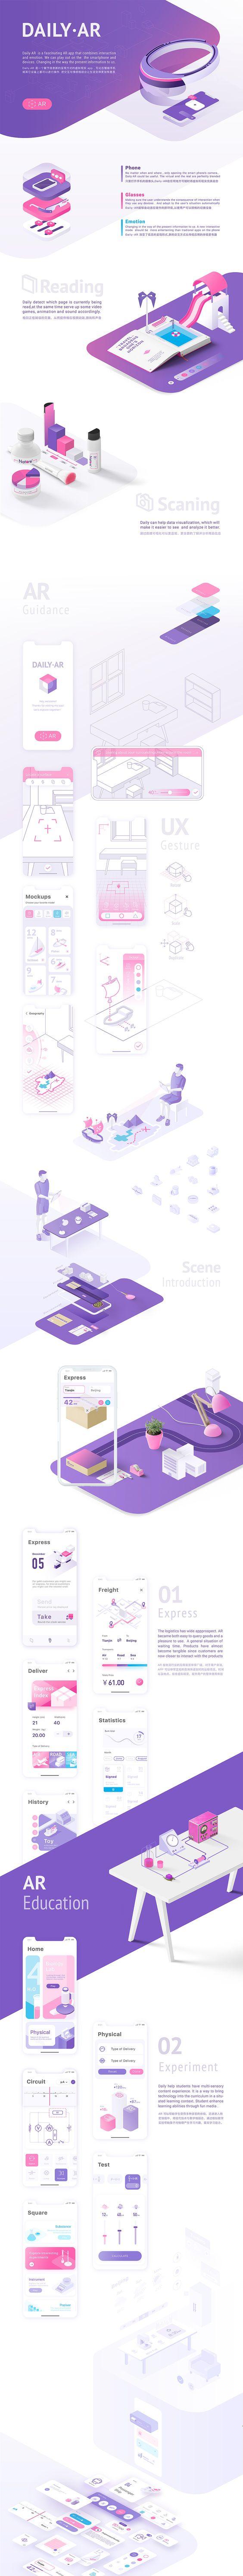 Daily·AR概念界面设计|UI|APP界面|哇过过 - 原创作品 - 站酷 (ZCOOL)